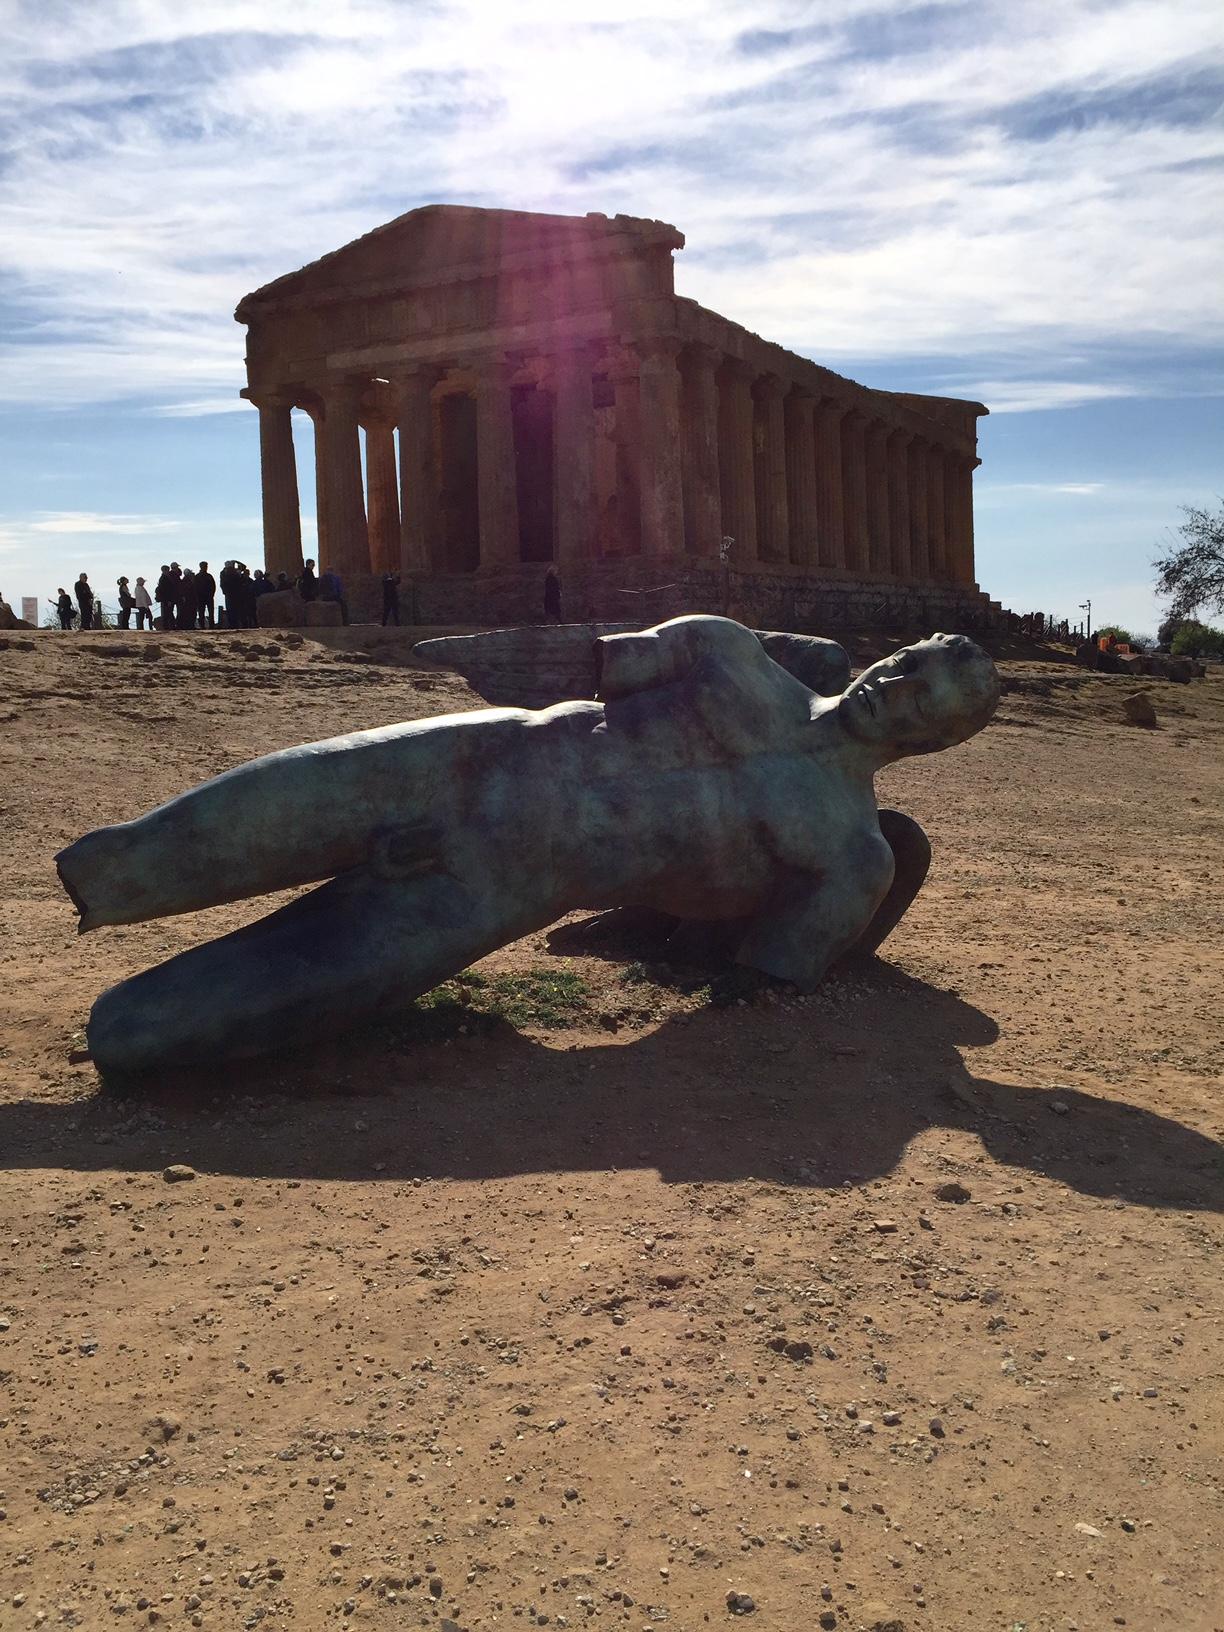 Italy-Sicily-Greek-temple-Icarus-Sharon-Birke